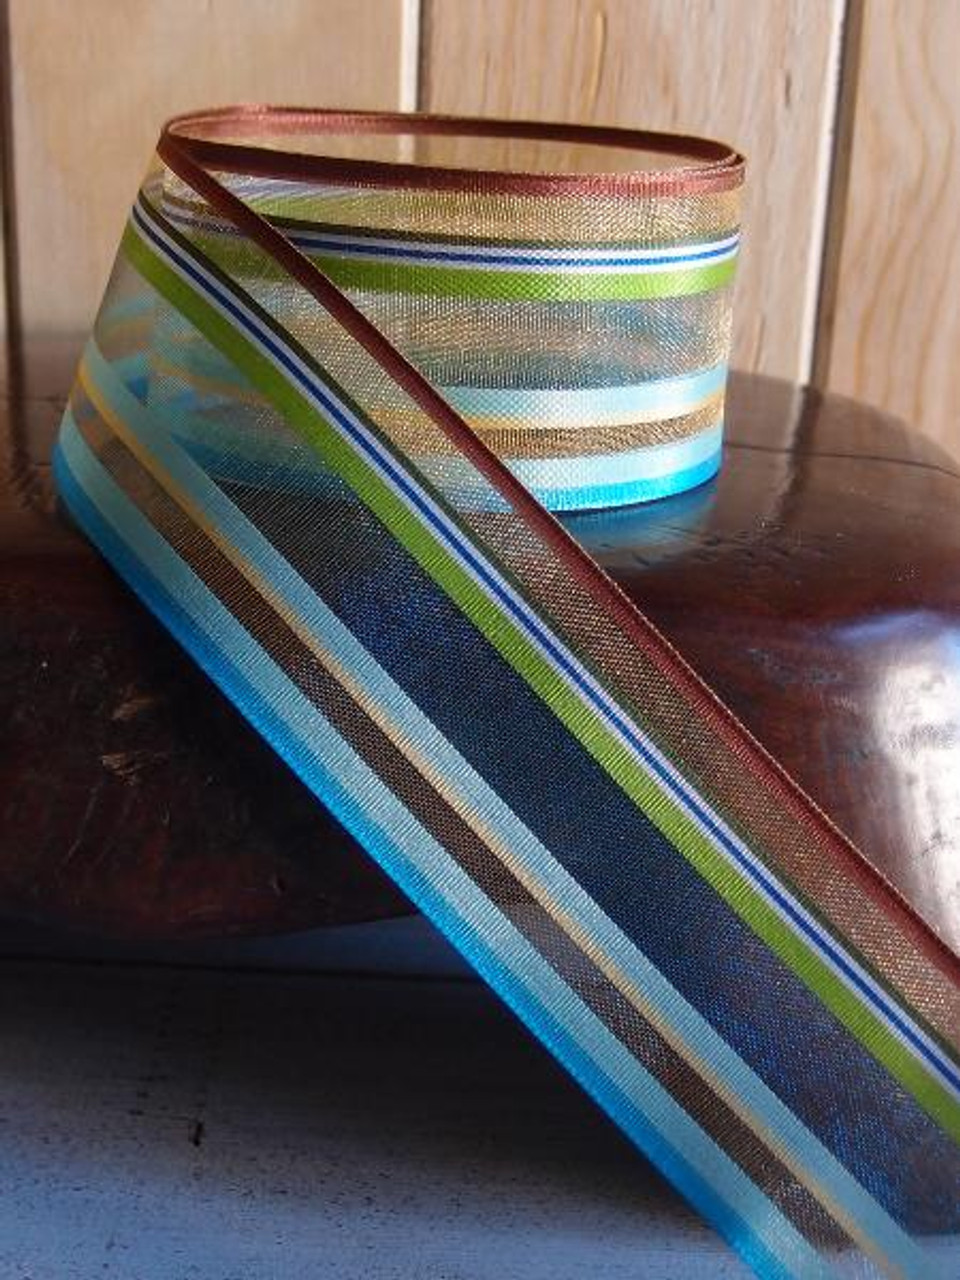 Brown-Green-Blue-White Multi-Stripes Sheer Ribbon